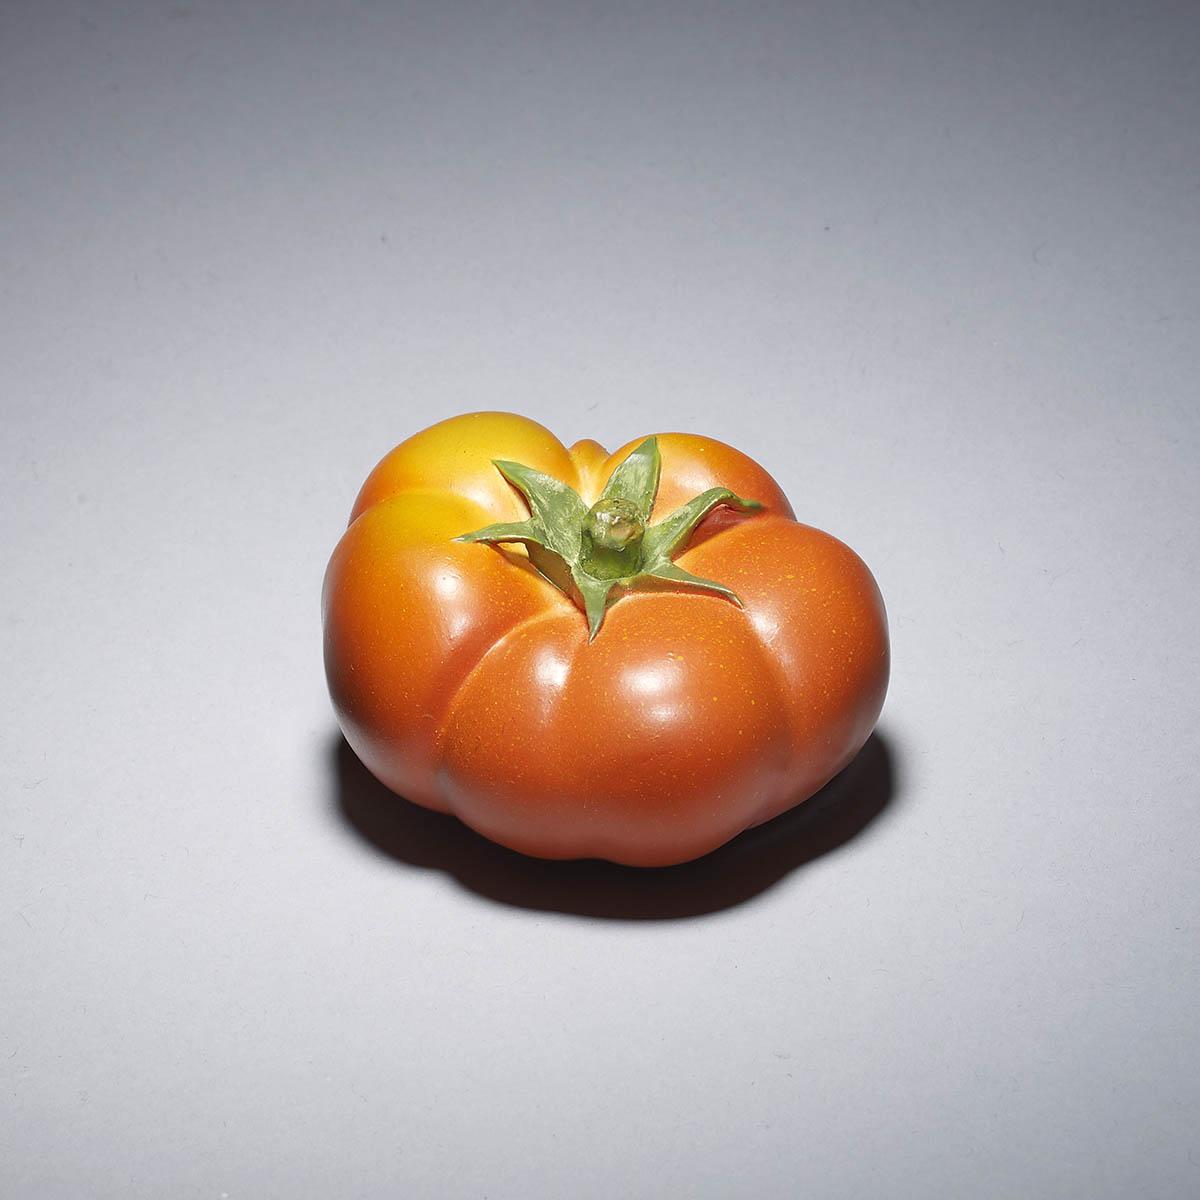 Stained ivory Okimono of a tomato